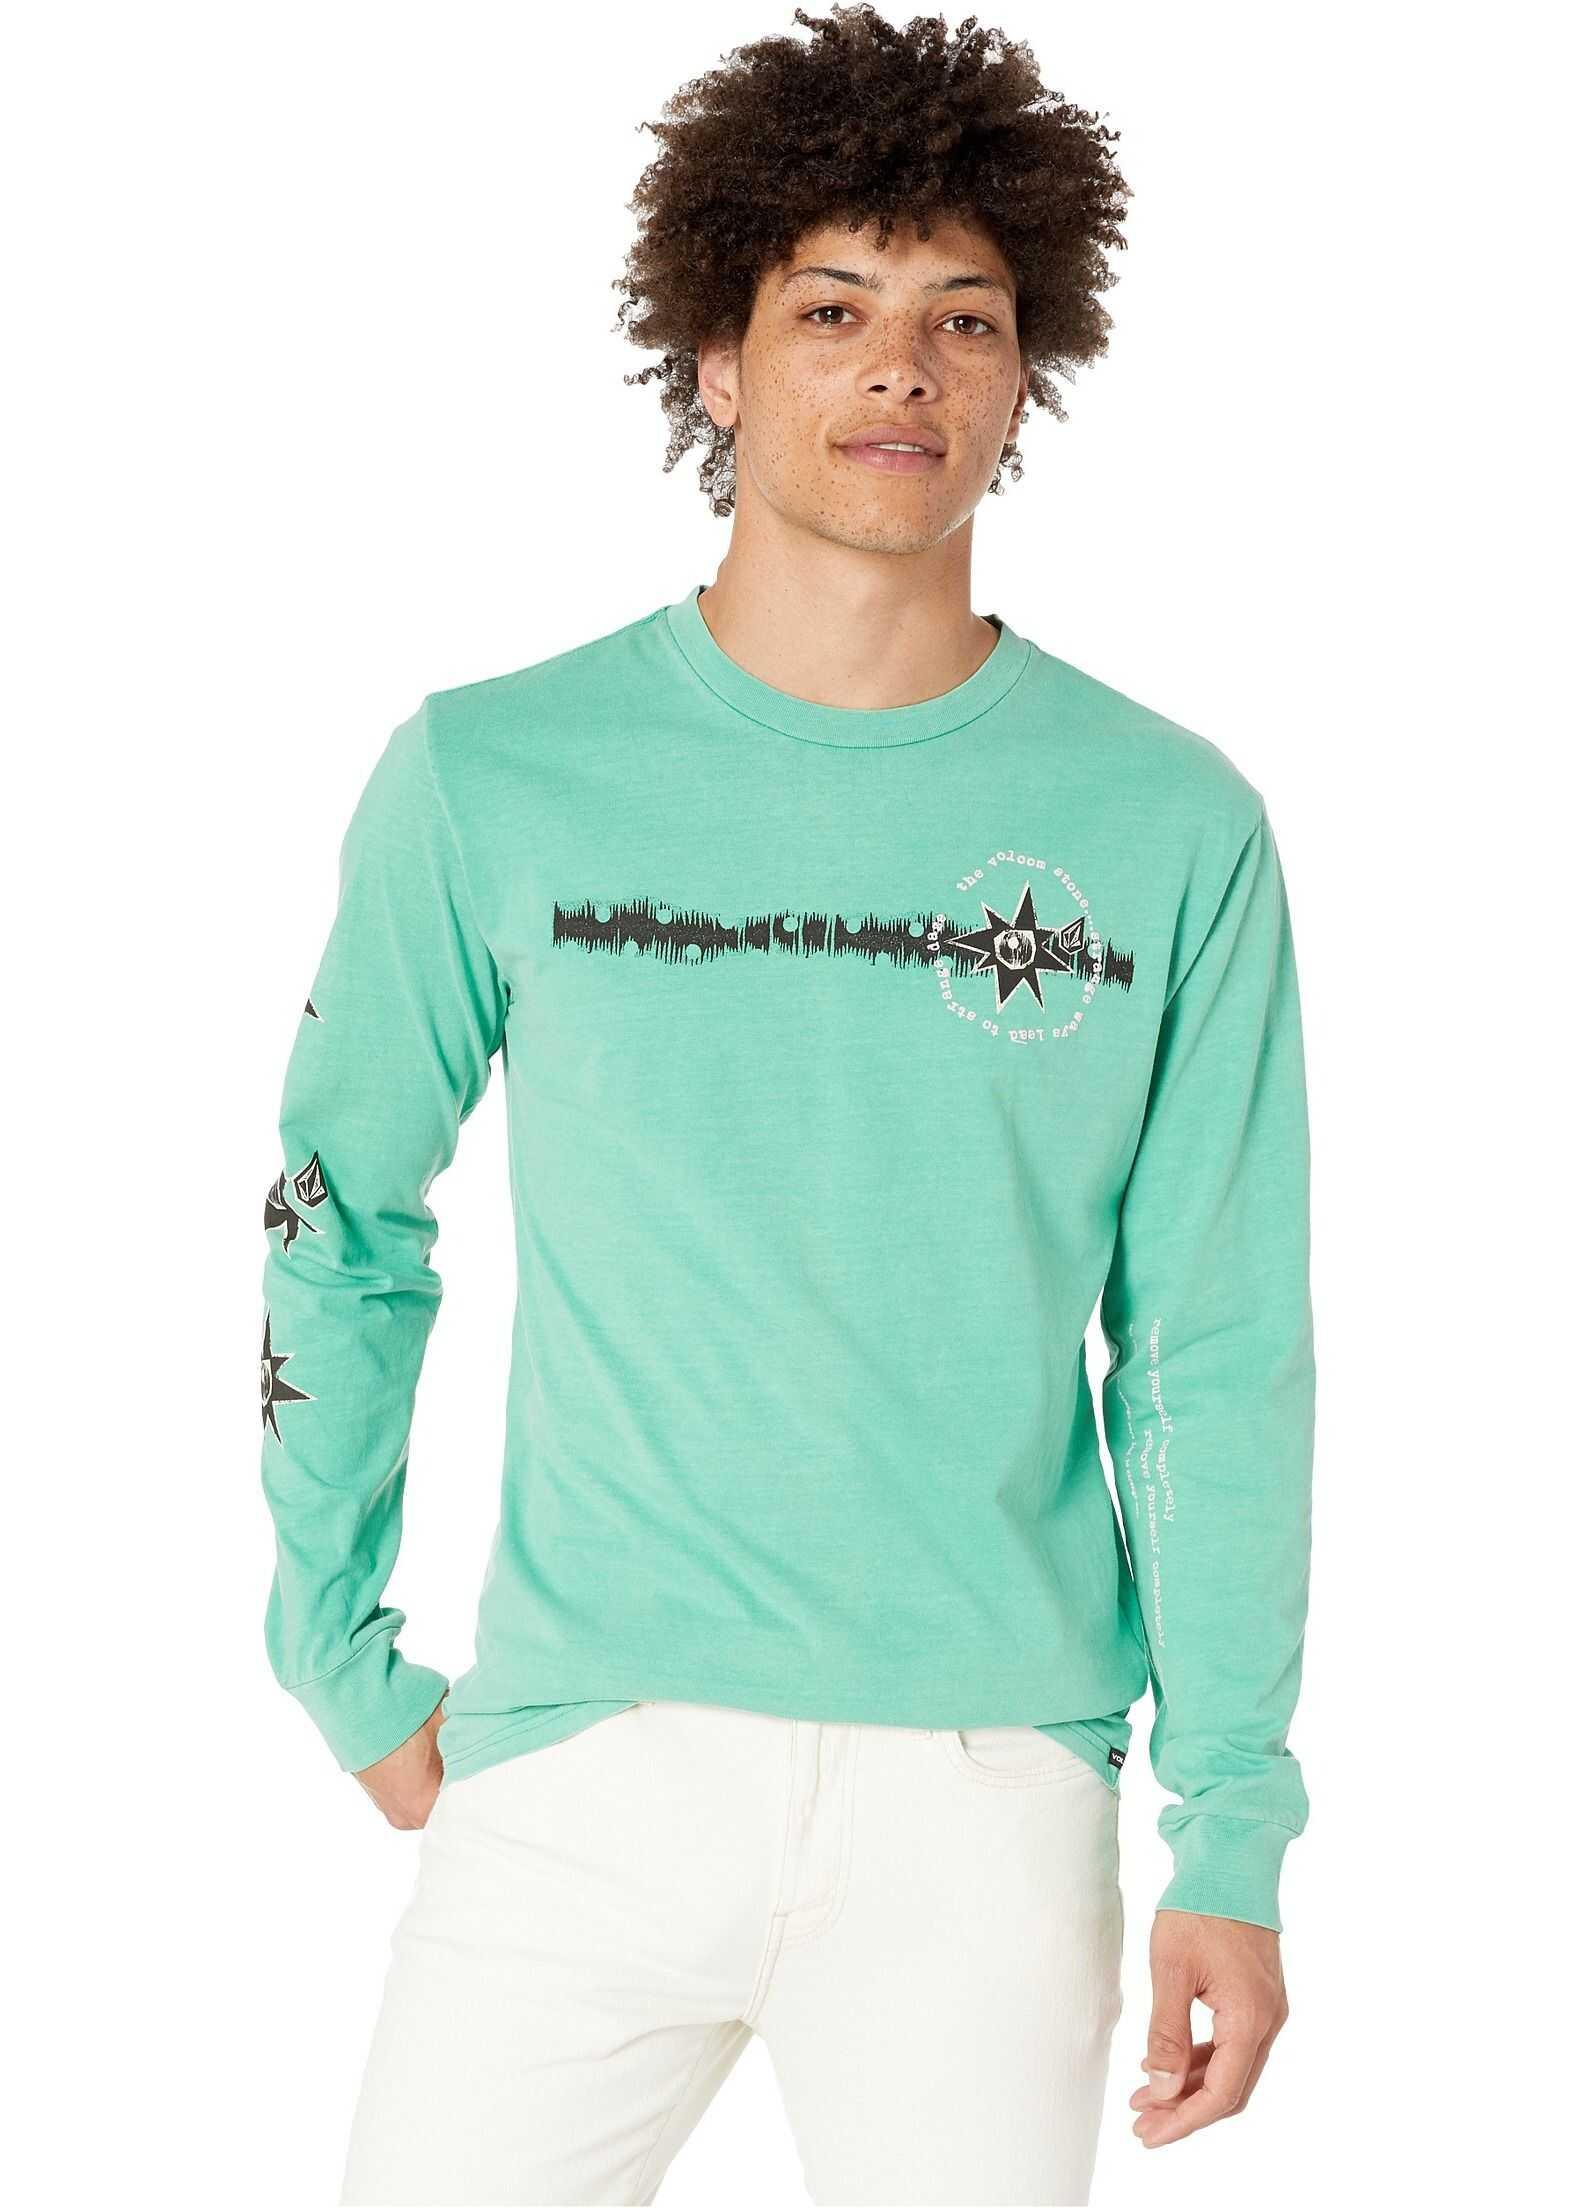 Volcom Mag Sketch Long Sleeve Tee* Wintergreen